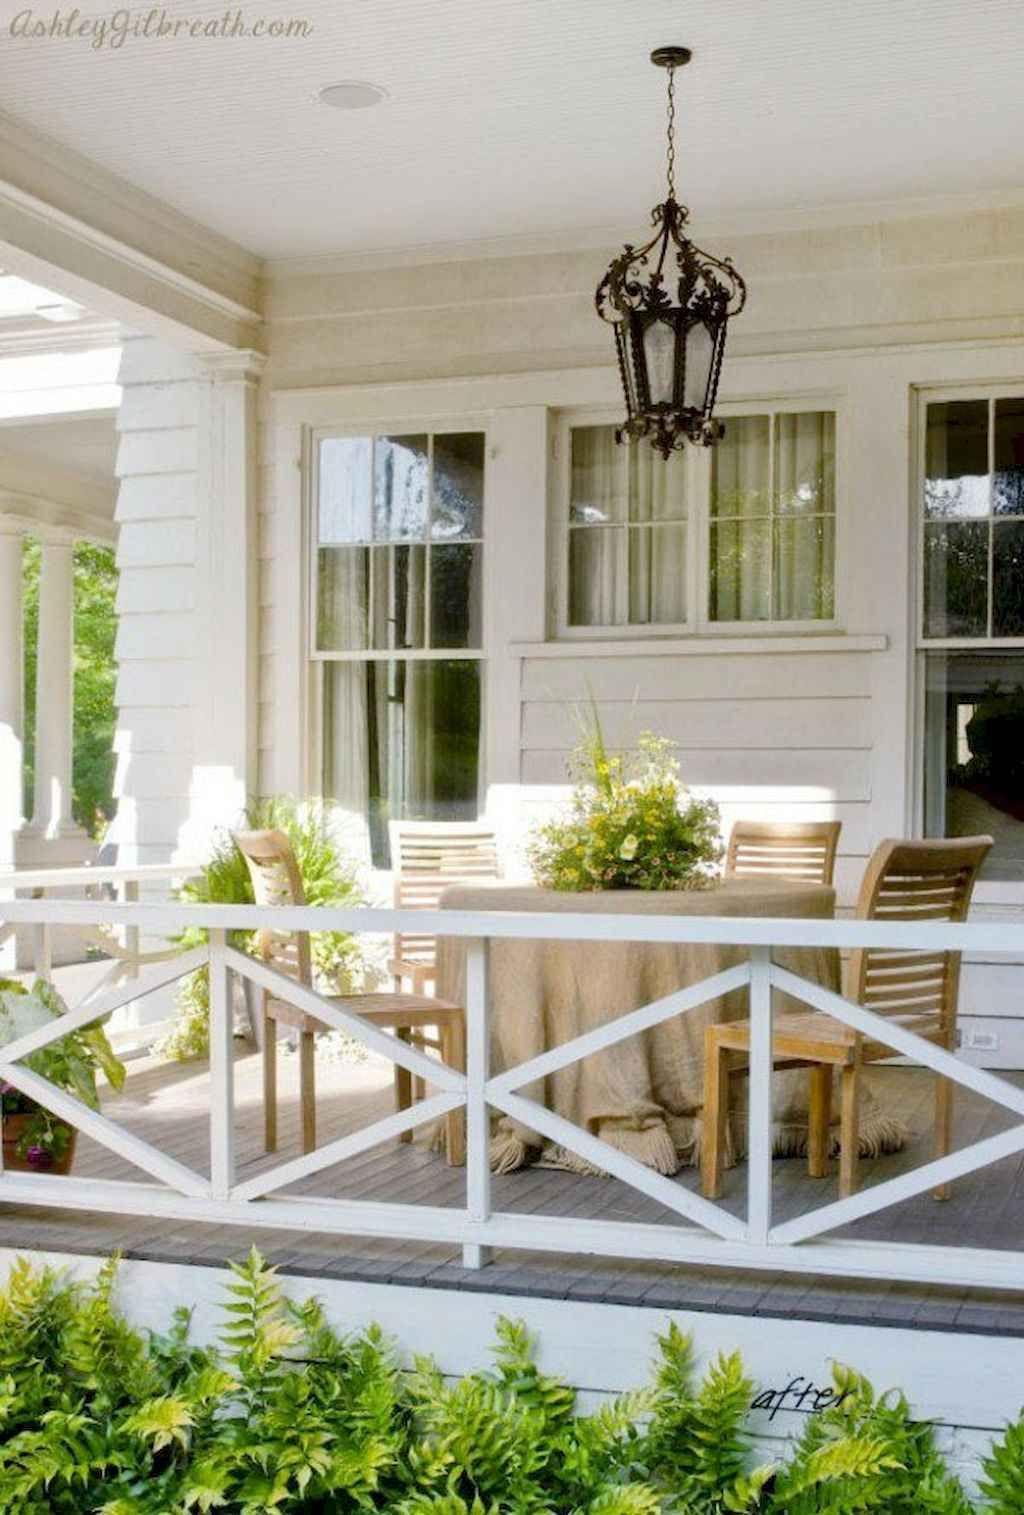 50 Deck Railing Ideas For Your Home 47 Roomadness Com Front Porch Railings Farmhouse Front Porches Porch Railing